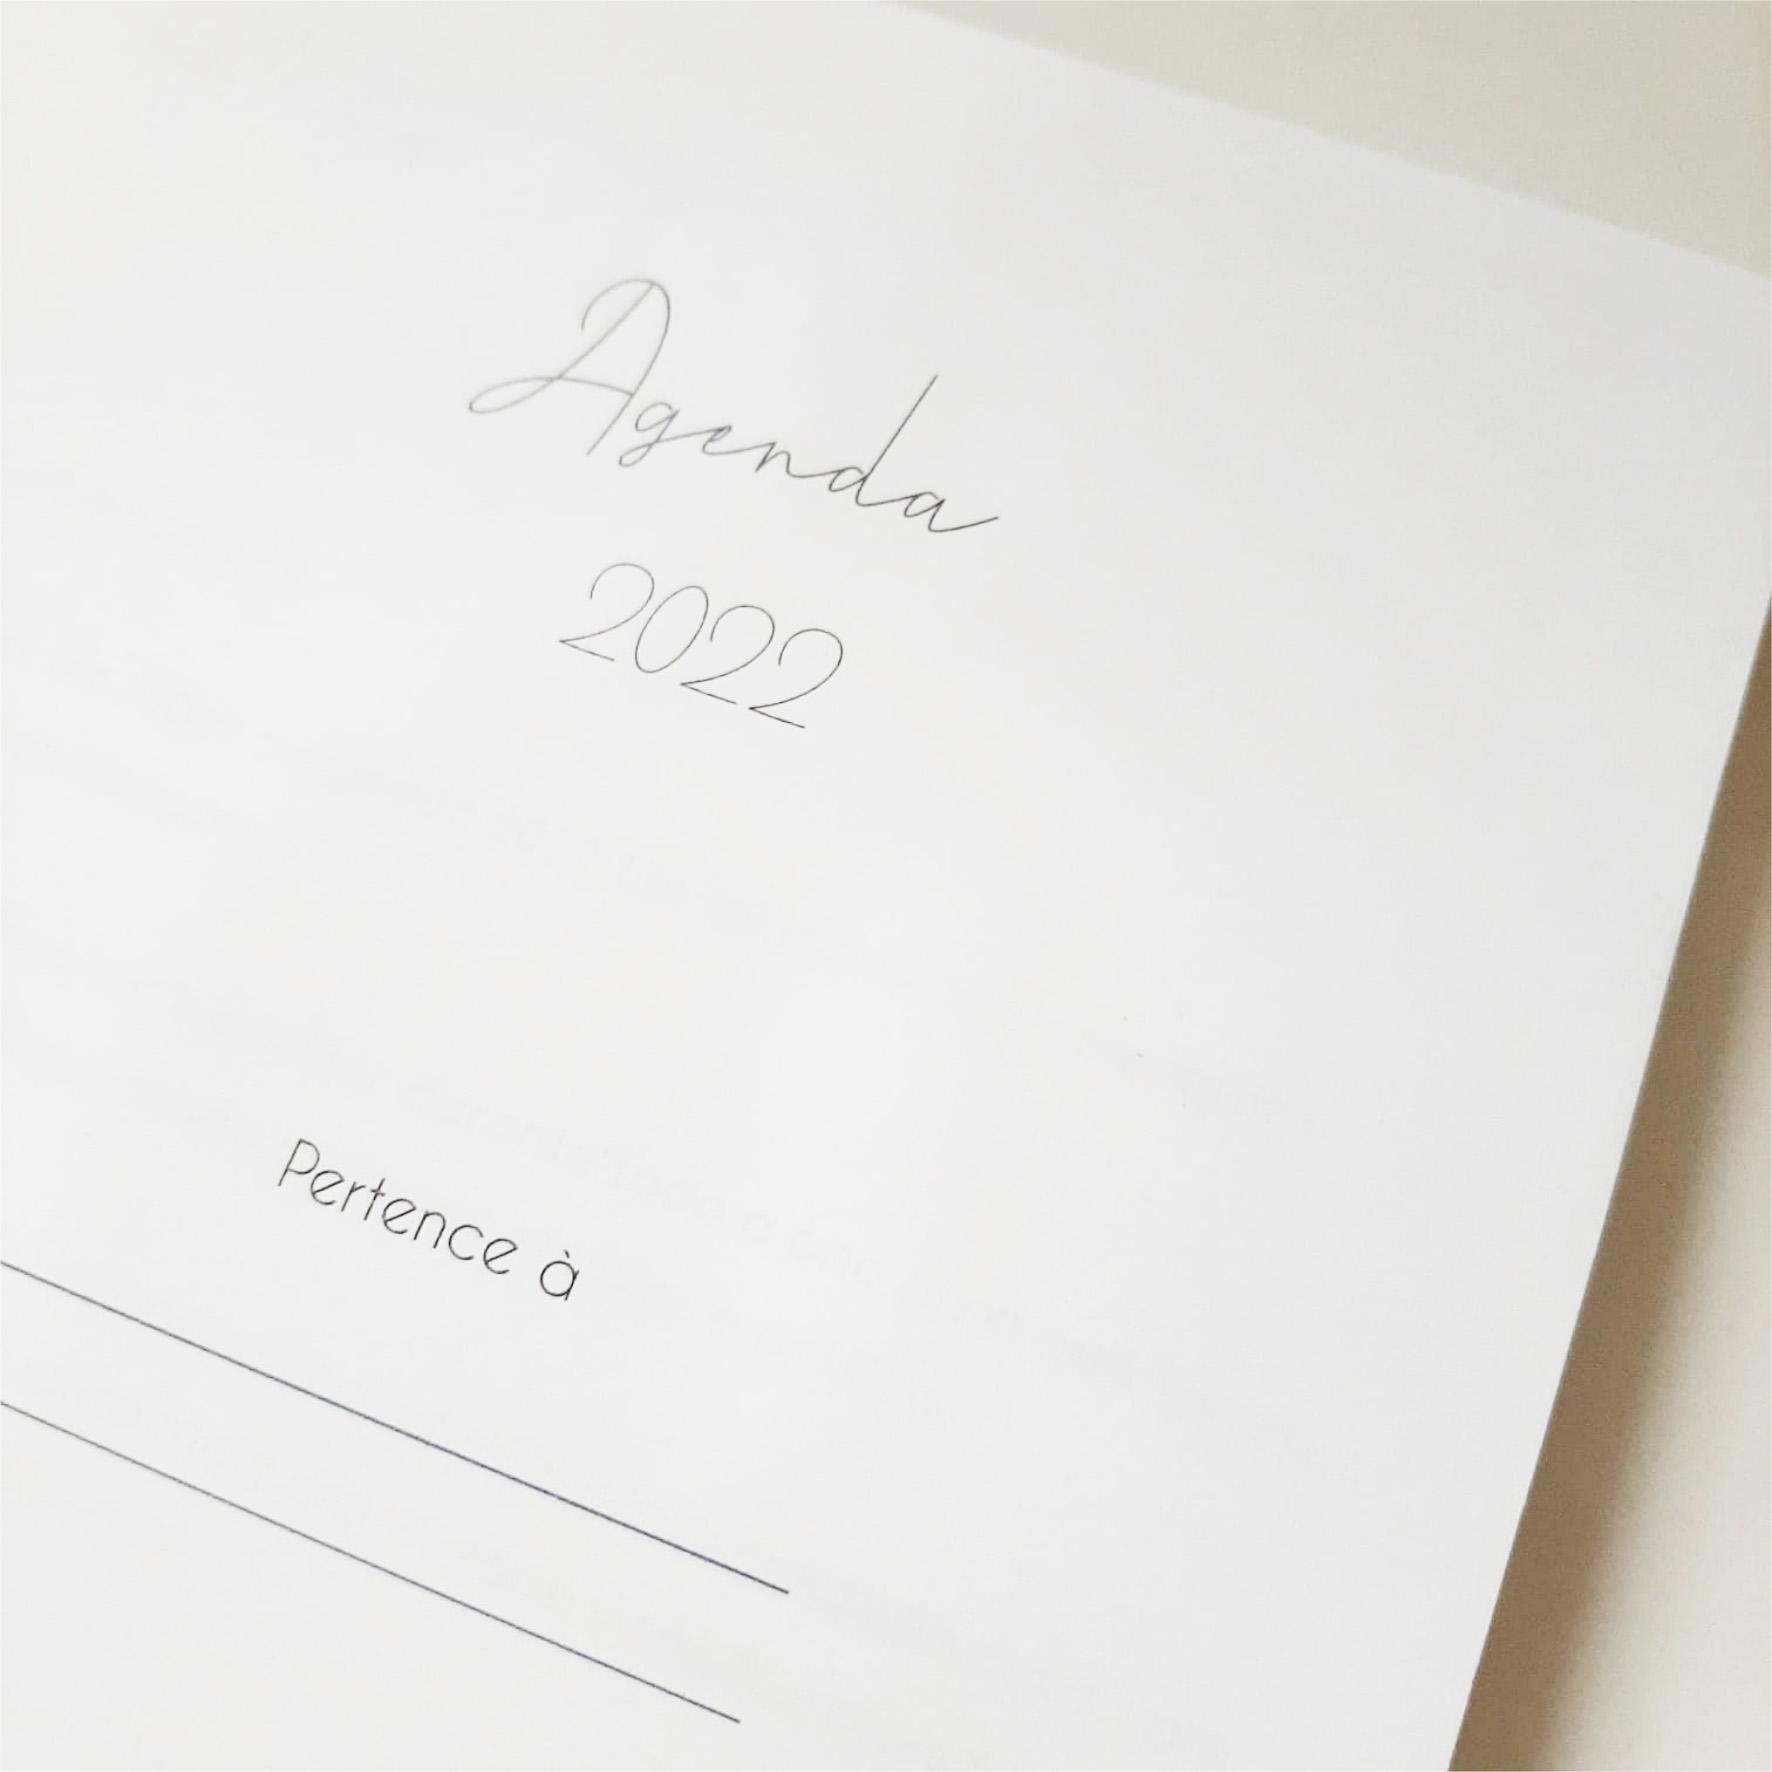 Agenda 2022 - Incrível